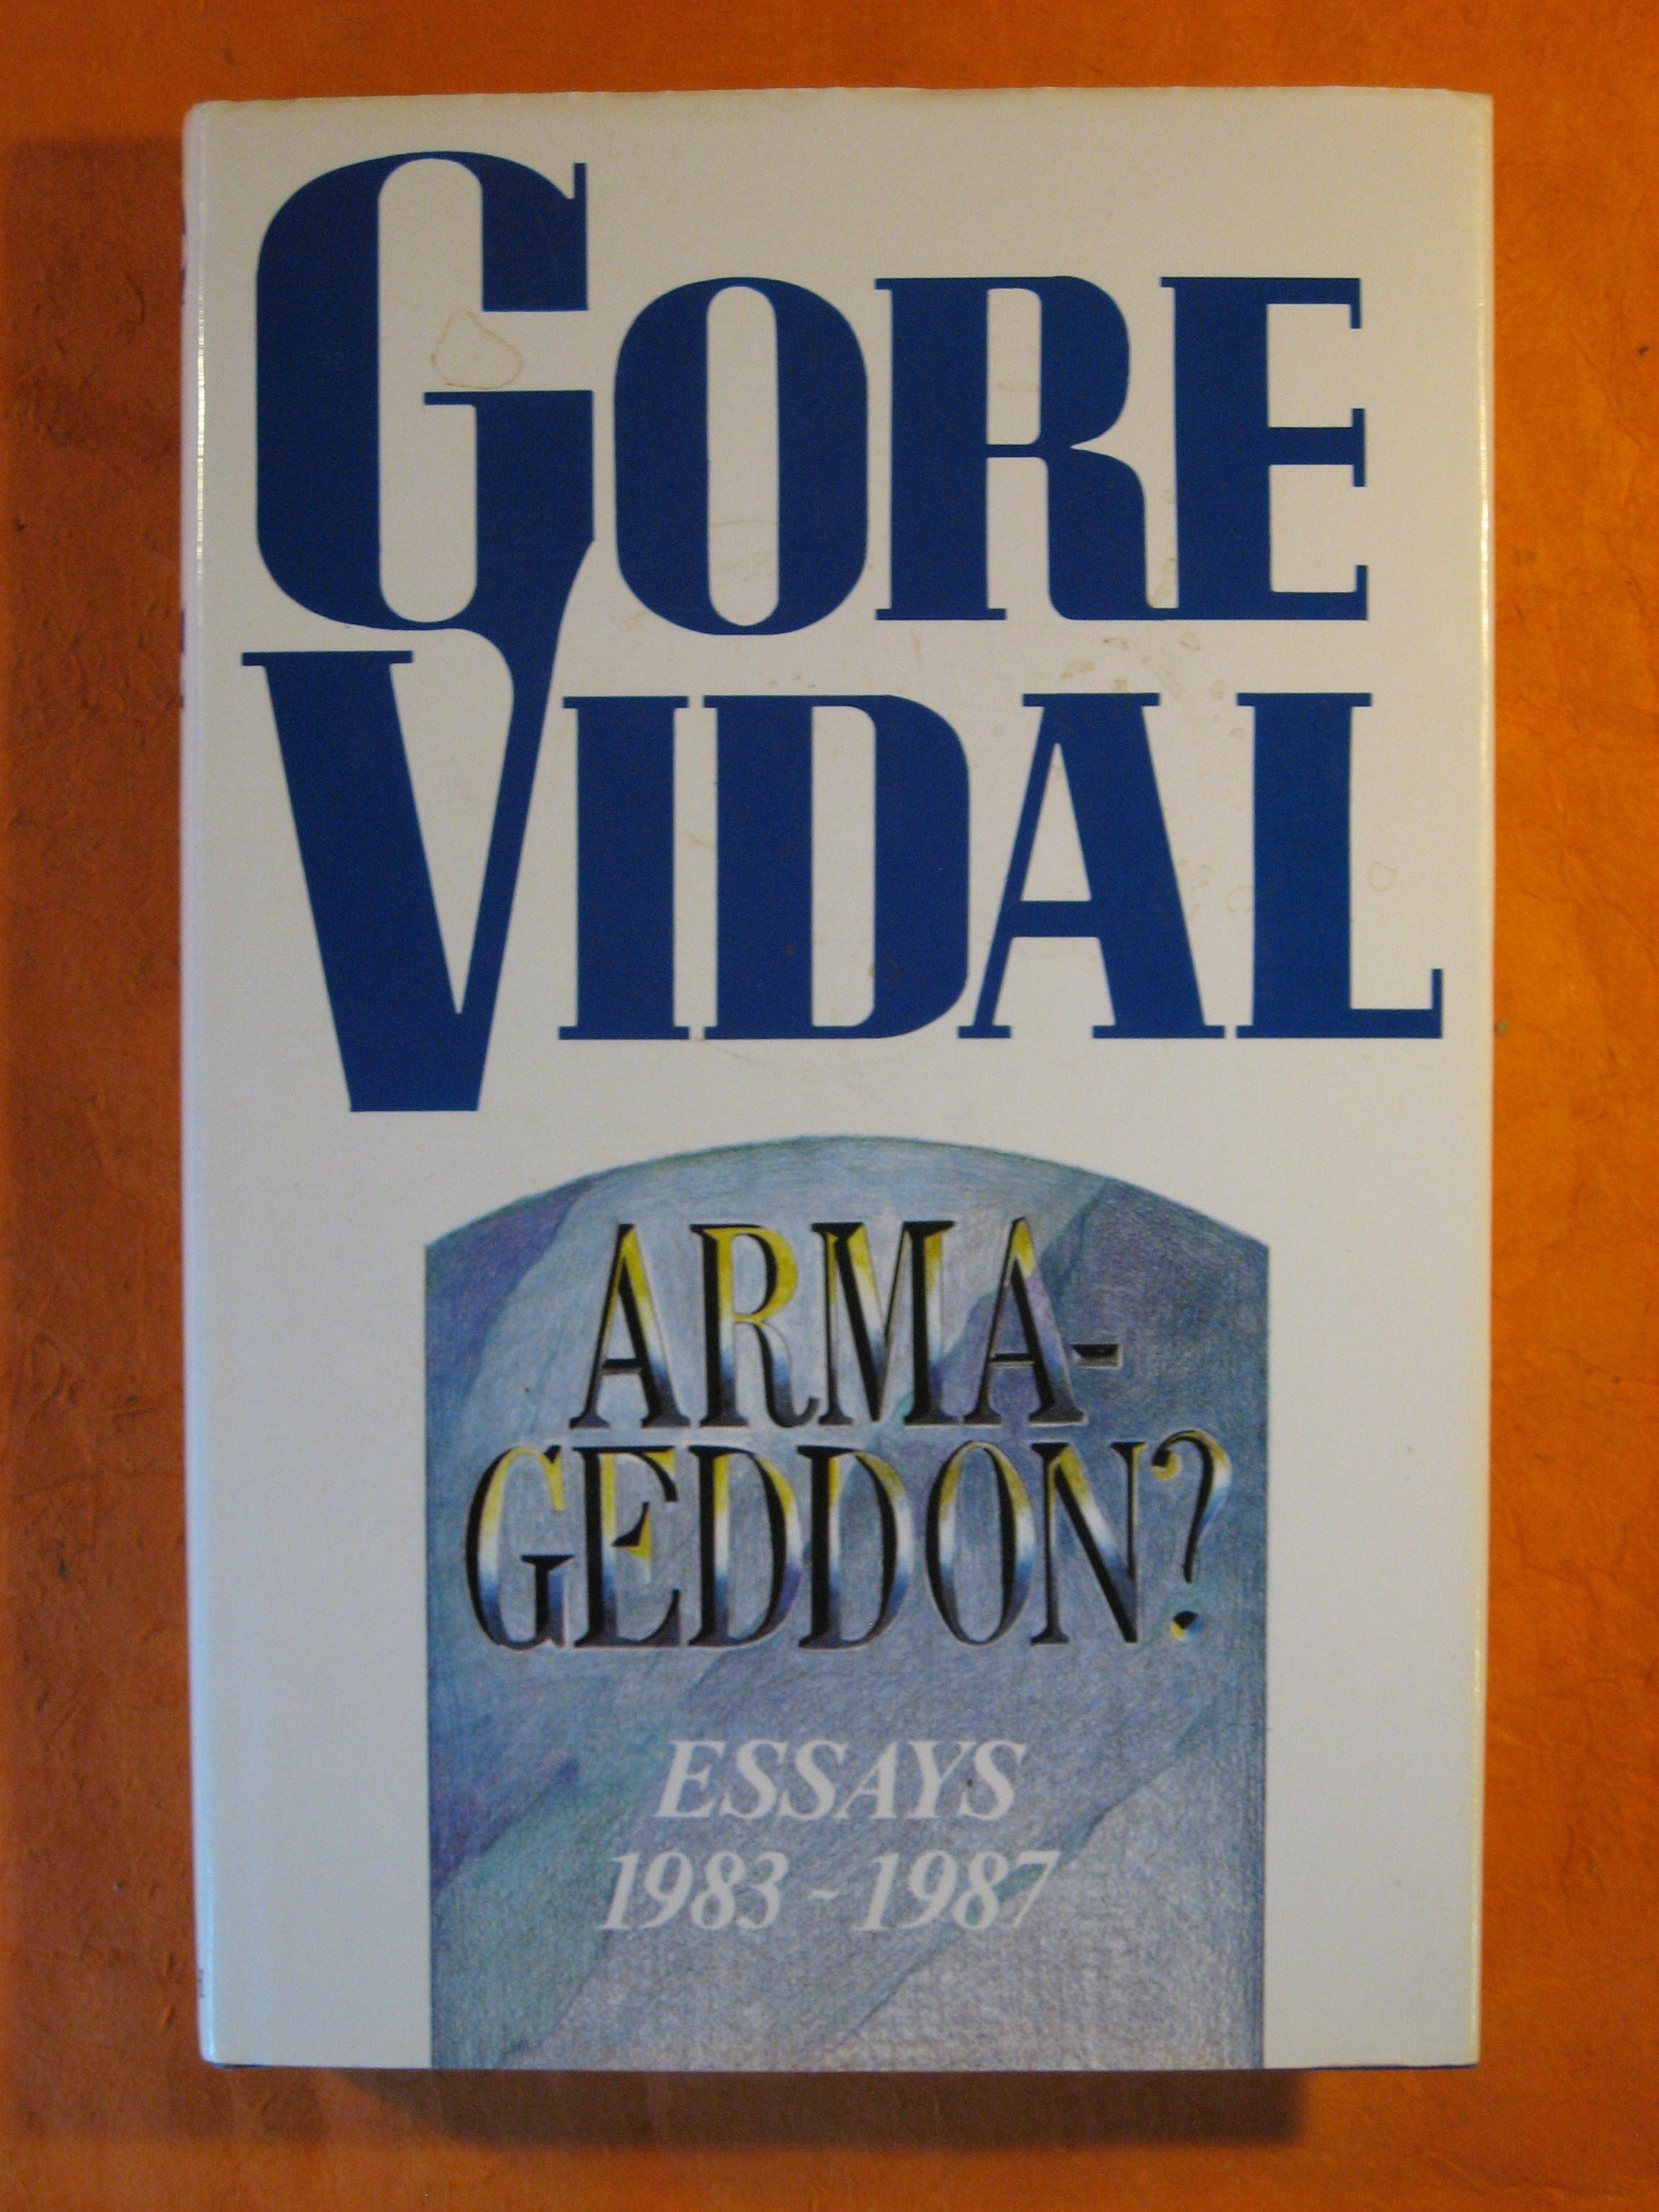 Armageddon? Essays 1983 1987